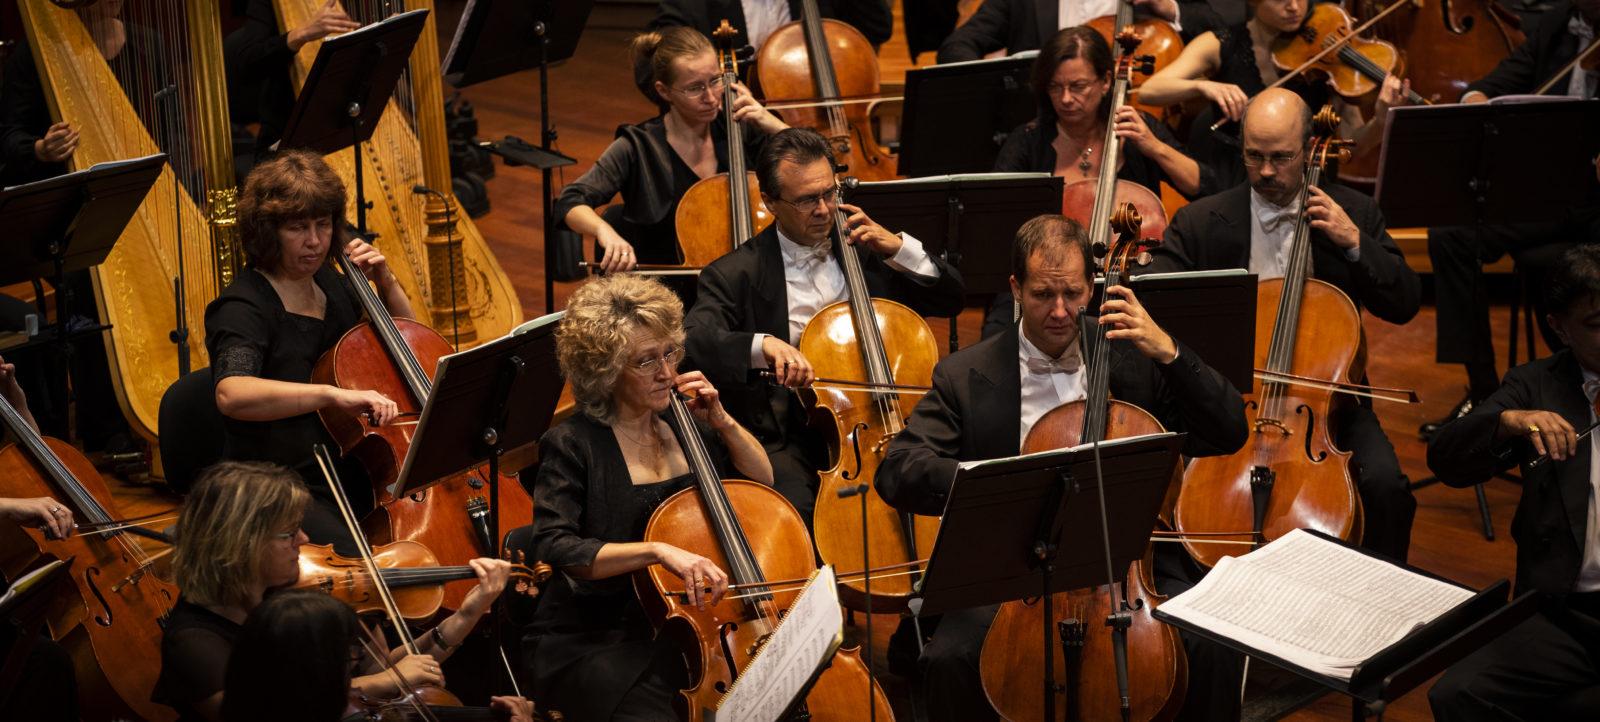 Apa és fia – a Nemzeti Filharmonikus Zenekar koncertje